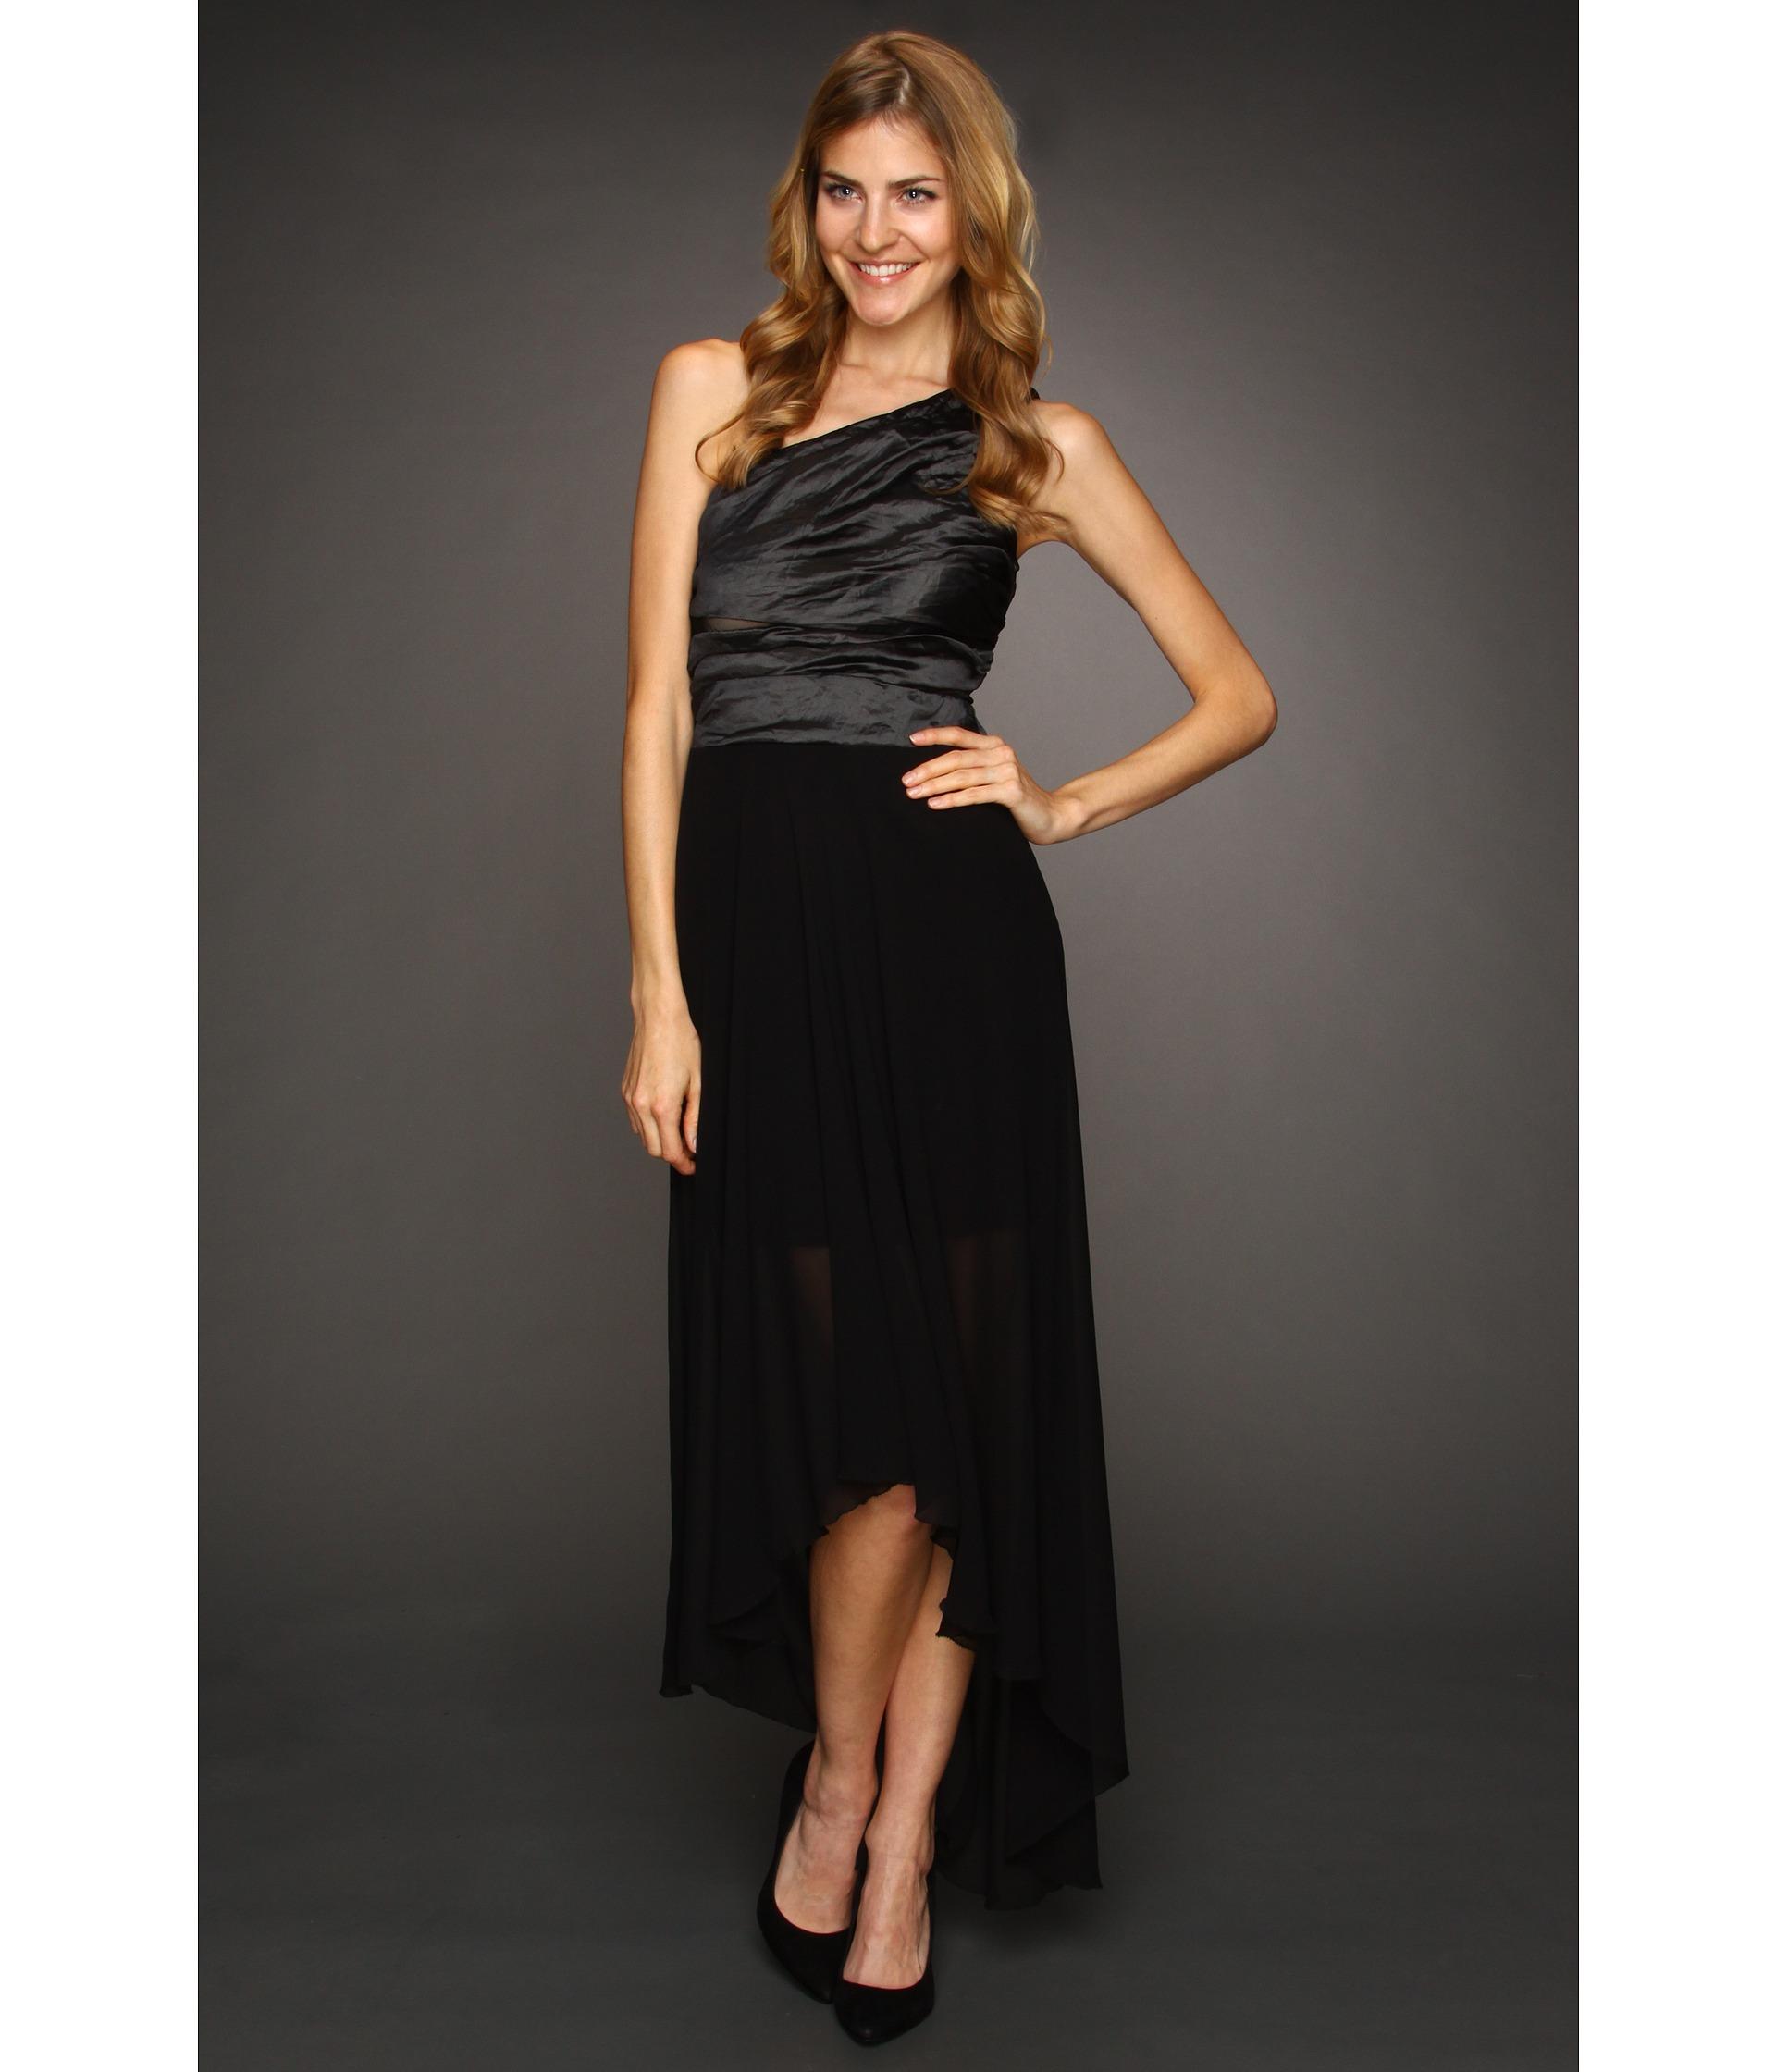 Nicole Miller Techno Metal One Shoulder Gown $525.99 $585.00 SALE